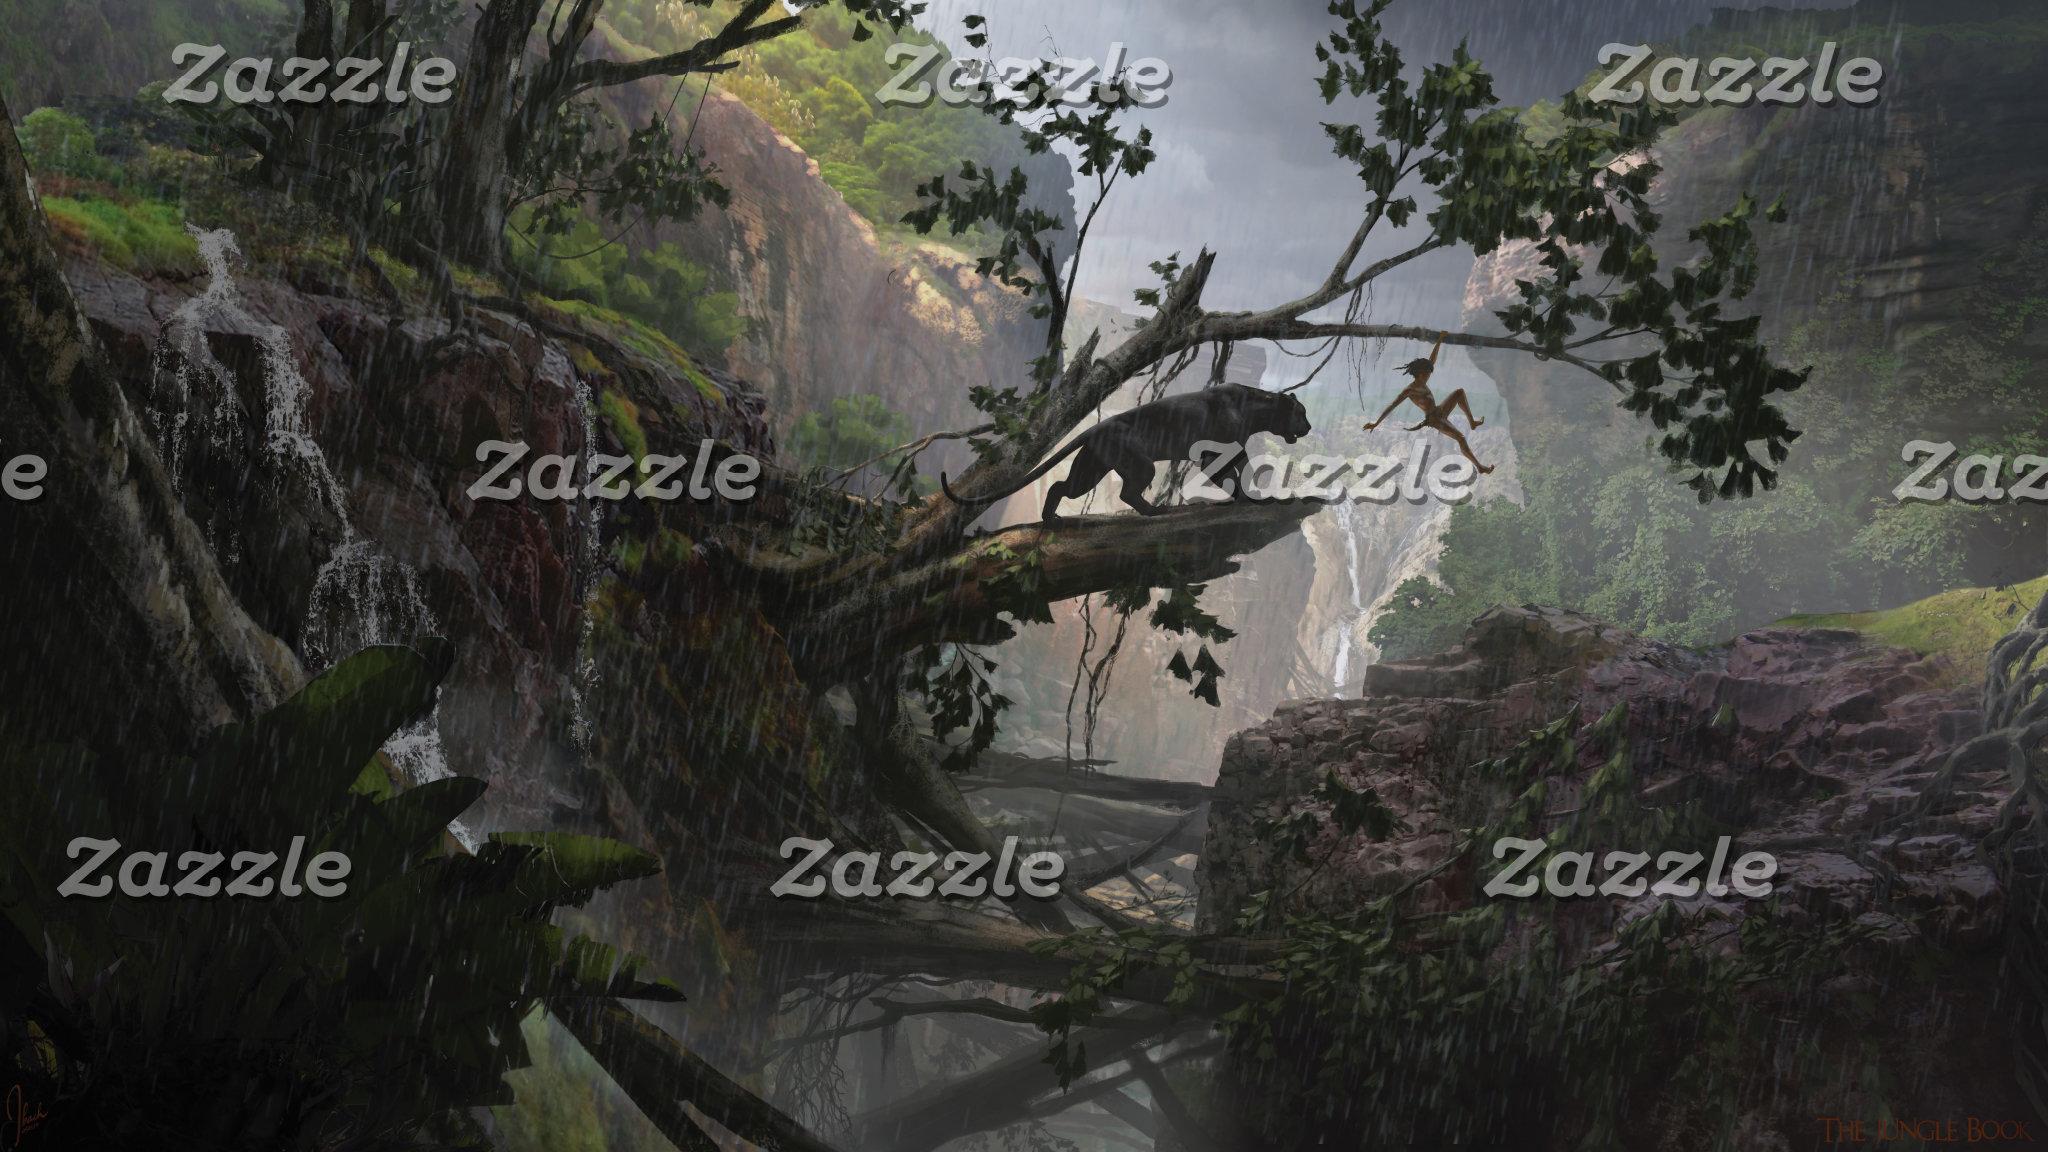 Jungle Book - Mystery of the Jungle